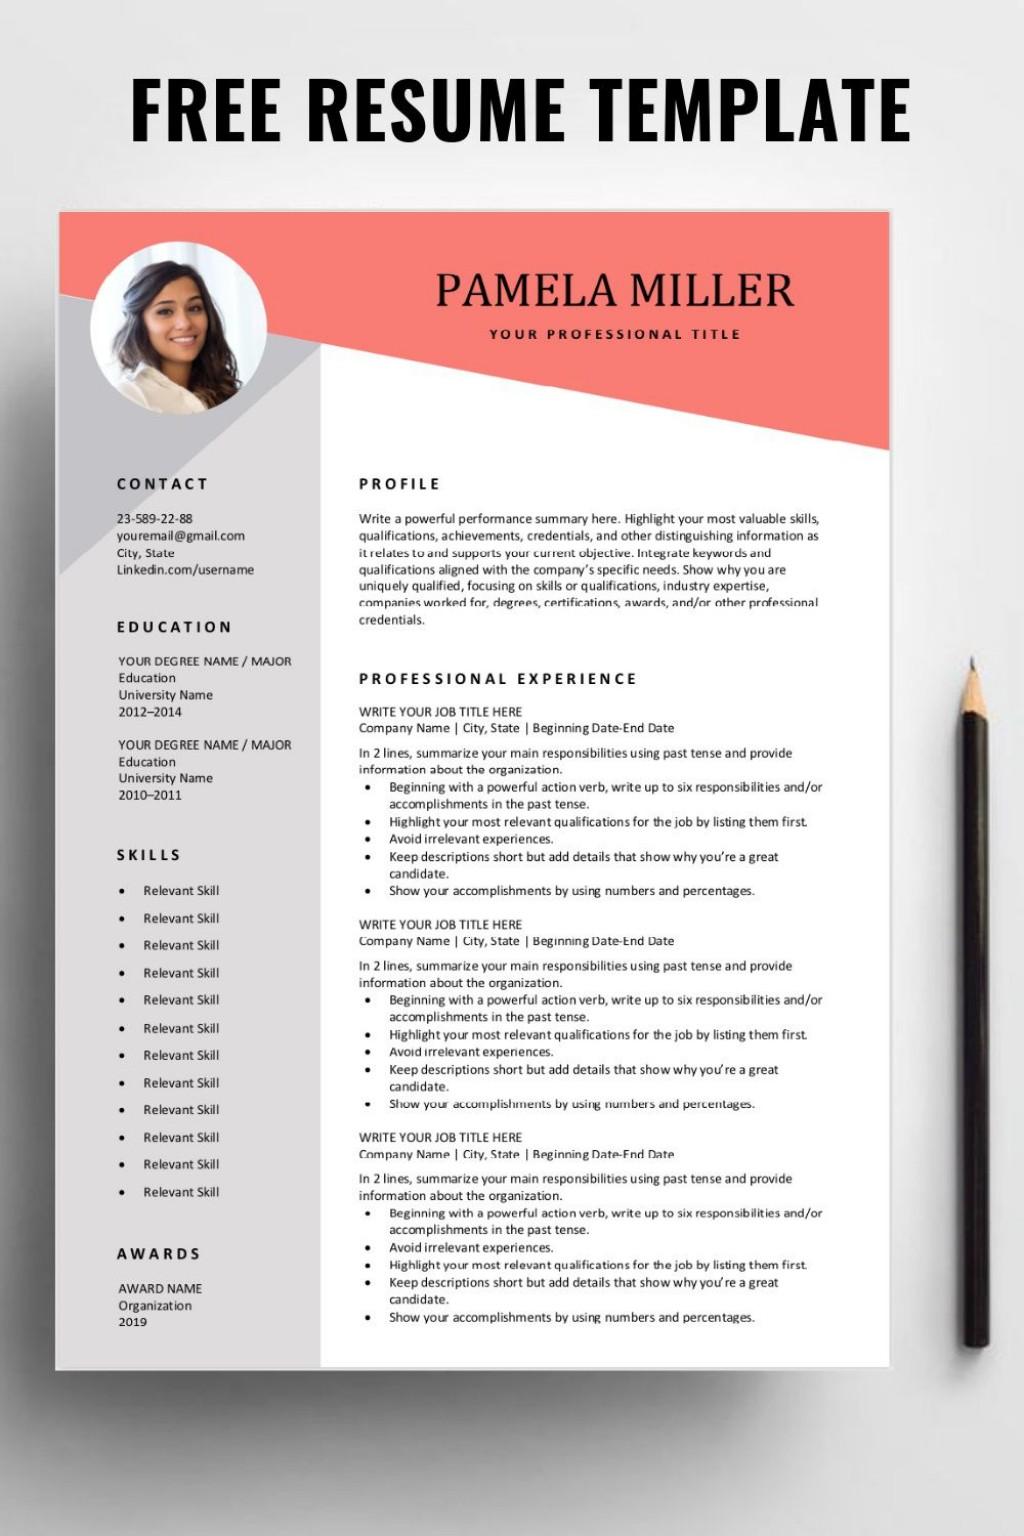 001 Impressive Resume Template For Free Sample  Best Word Freelance Writer MicrosoftLarge